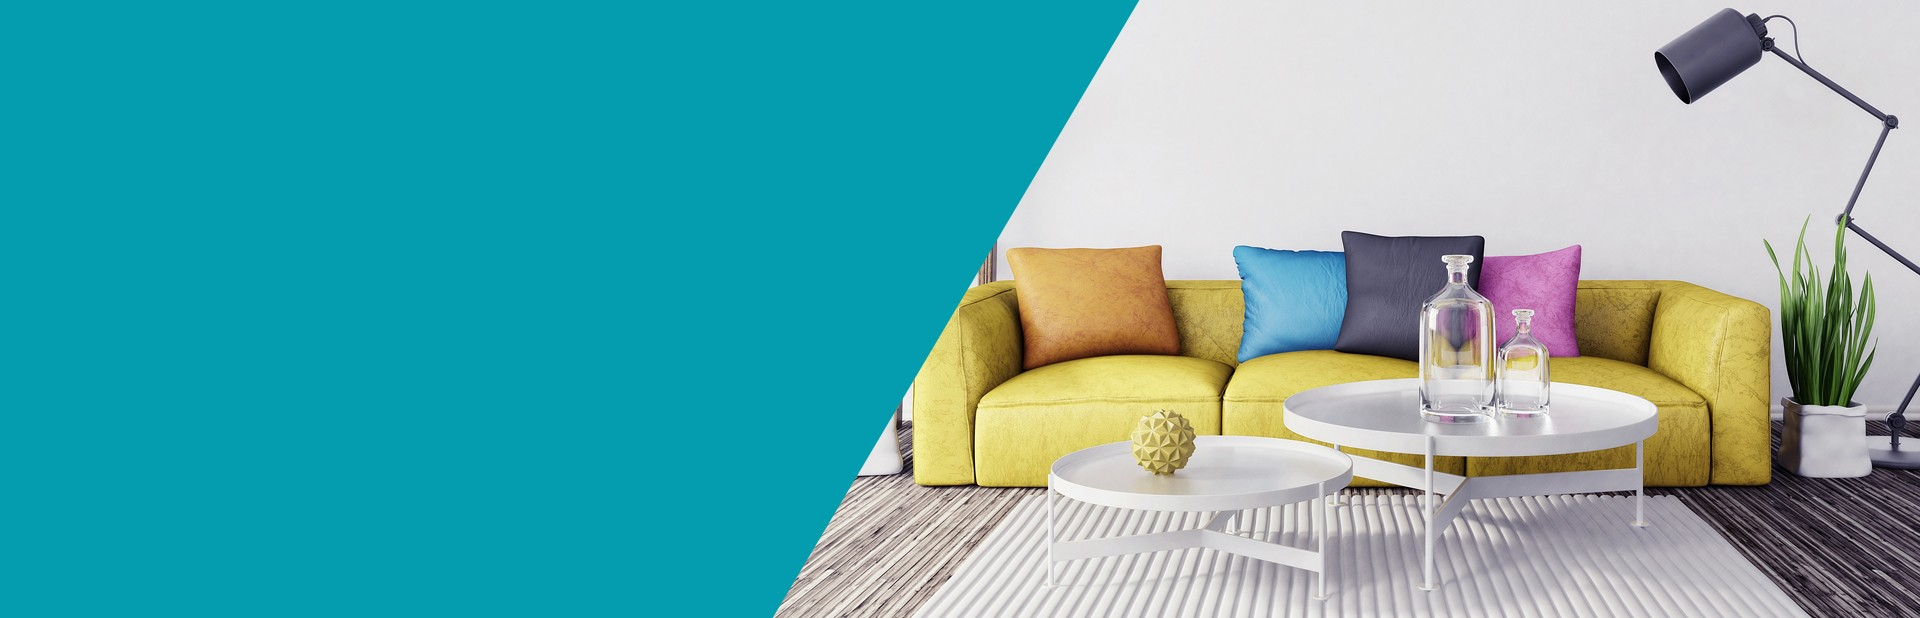 Phenomenal Asv Enterprises Linkedin Beatyapartments Chair Design Images Beatyapartmentscom